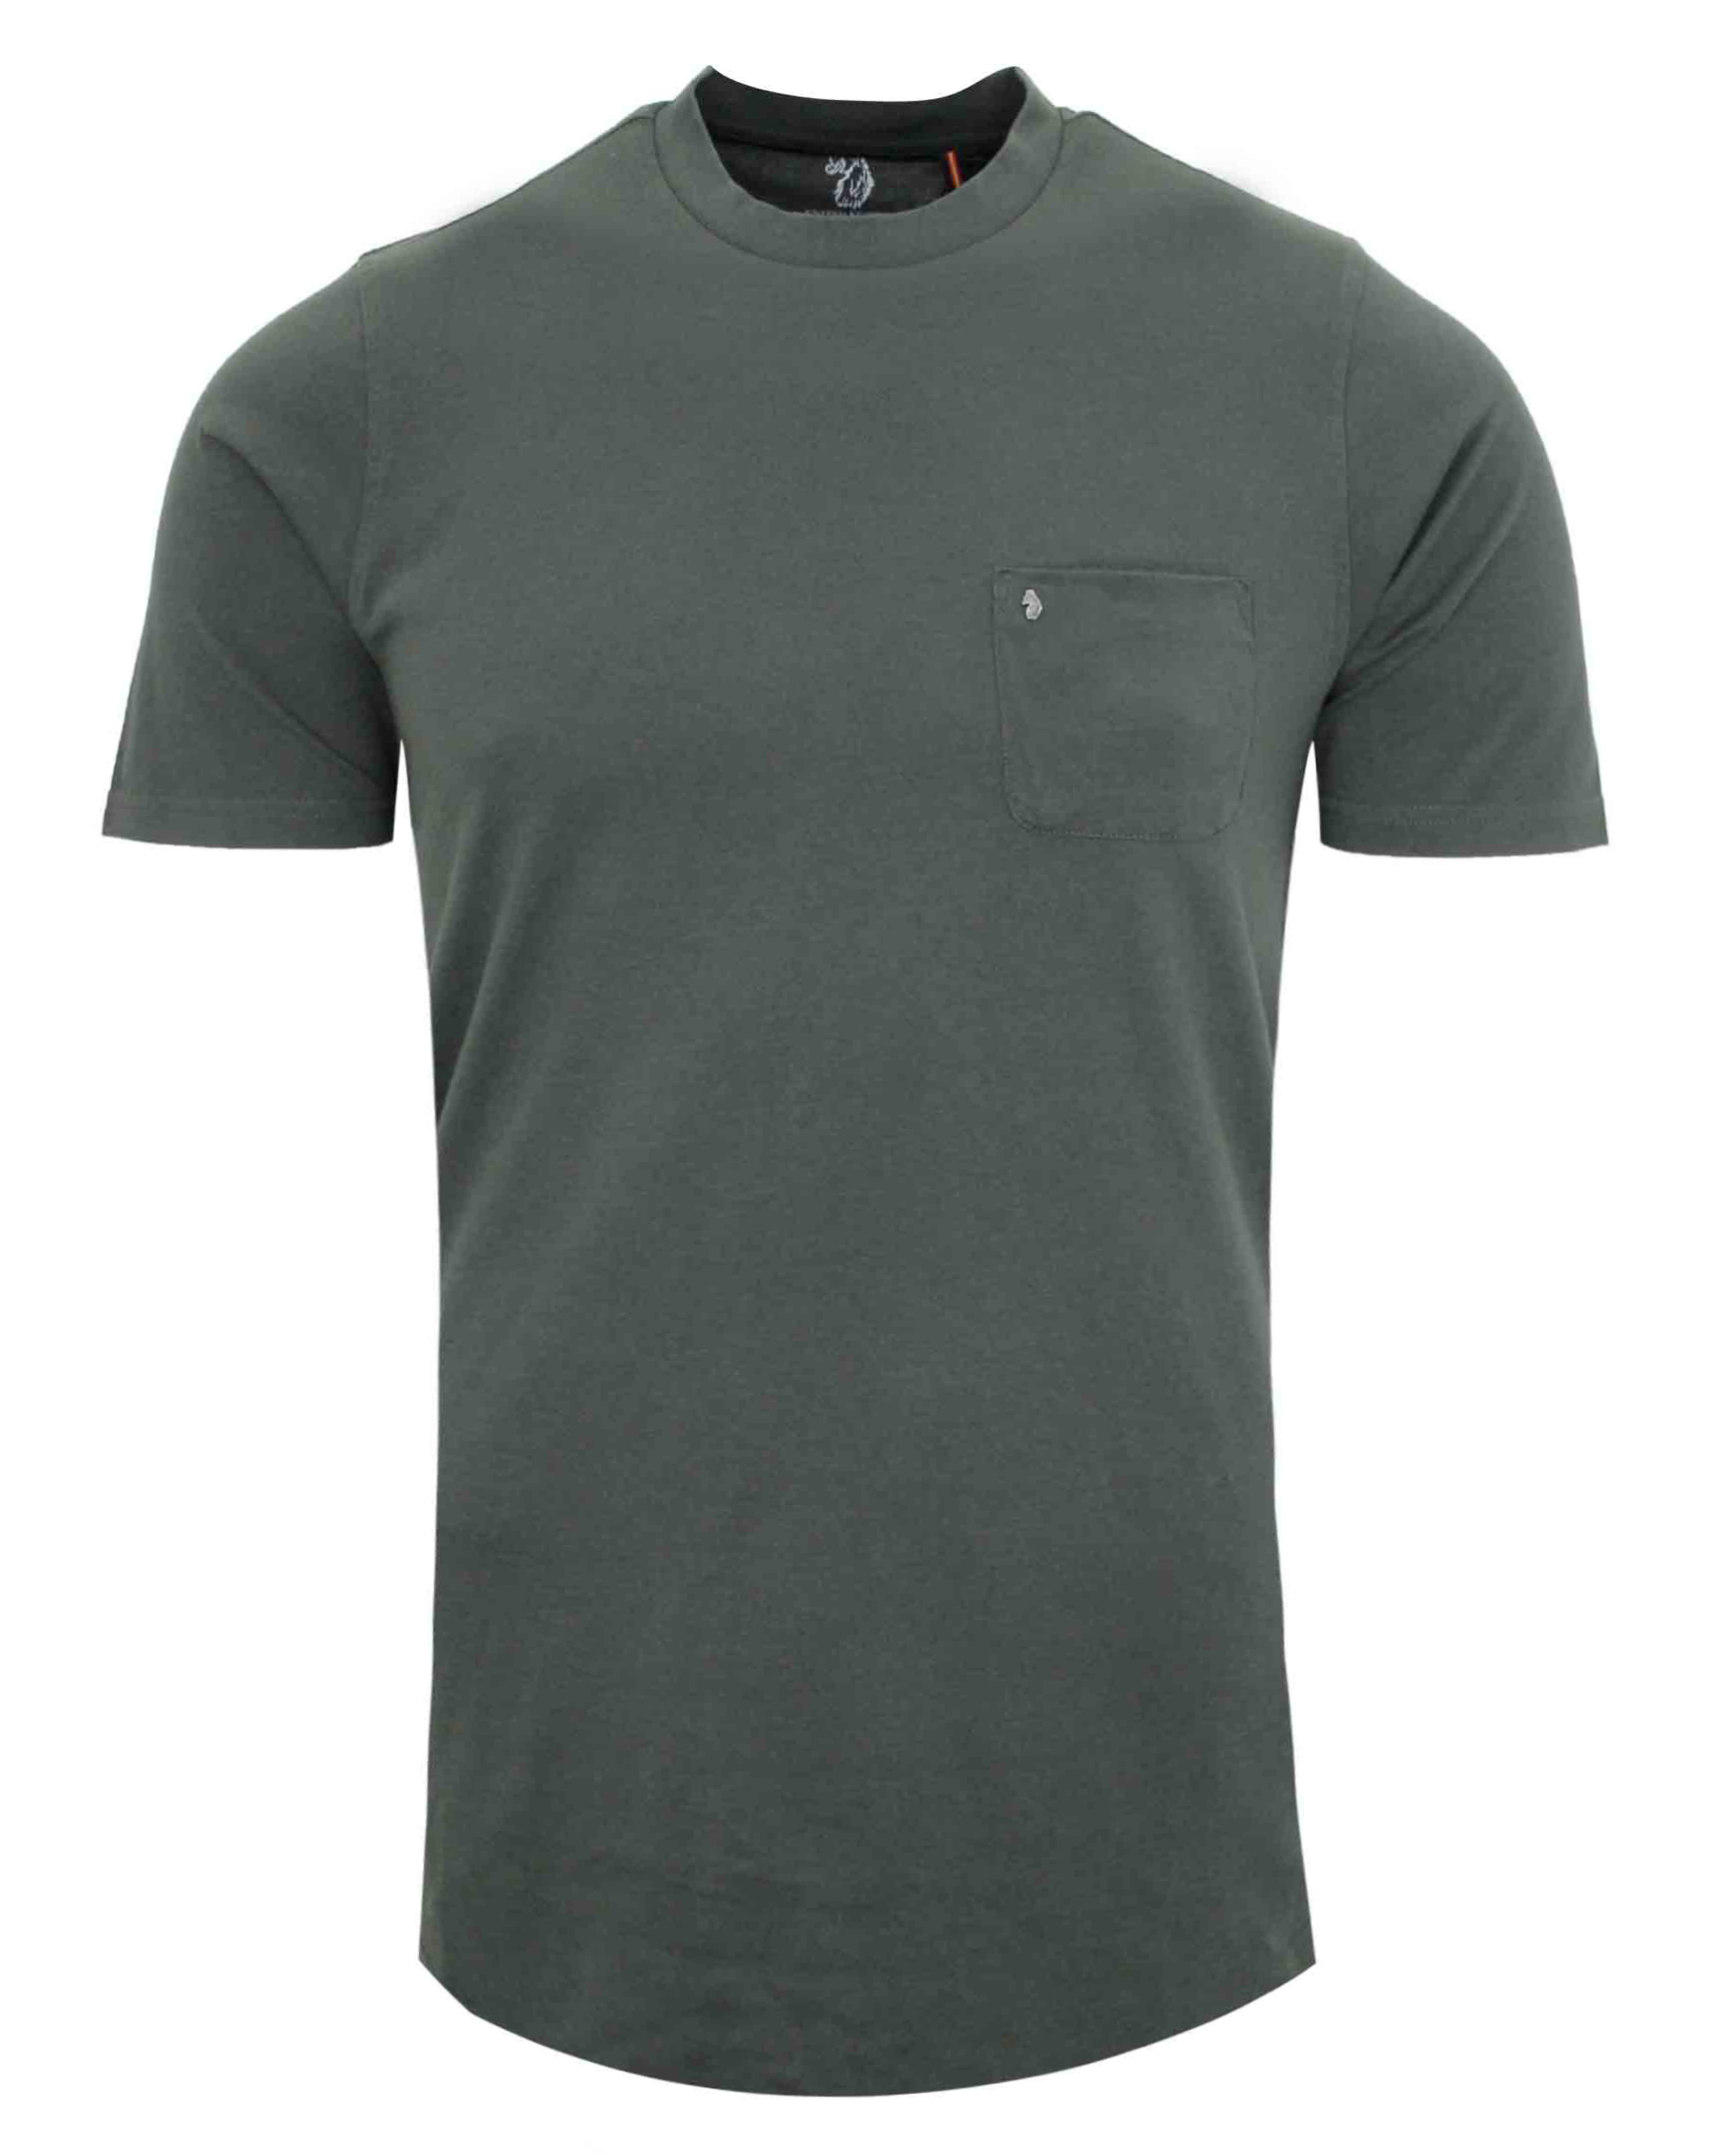 Shirt design uber - Shirt Design Uber 34